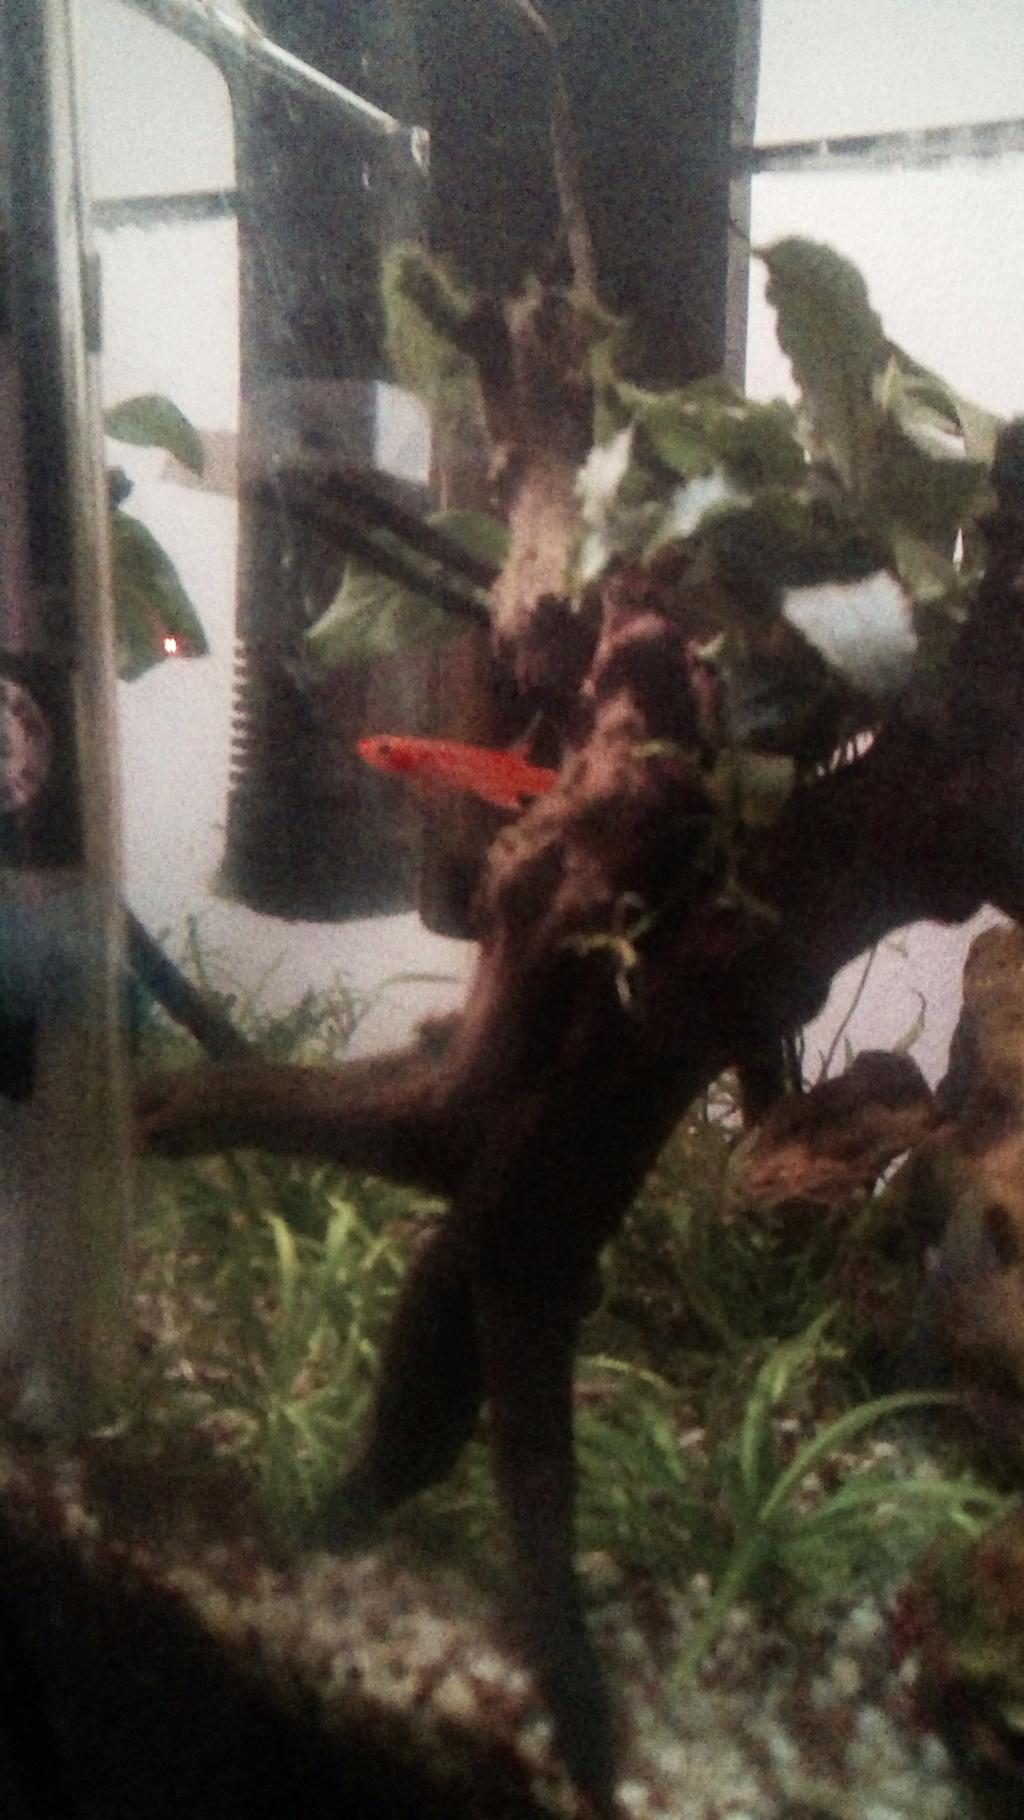 nano aquarium killi cap lopez - Page 4 Img_2308